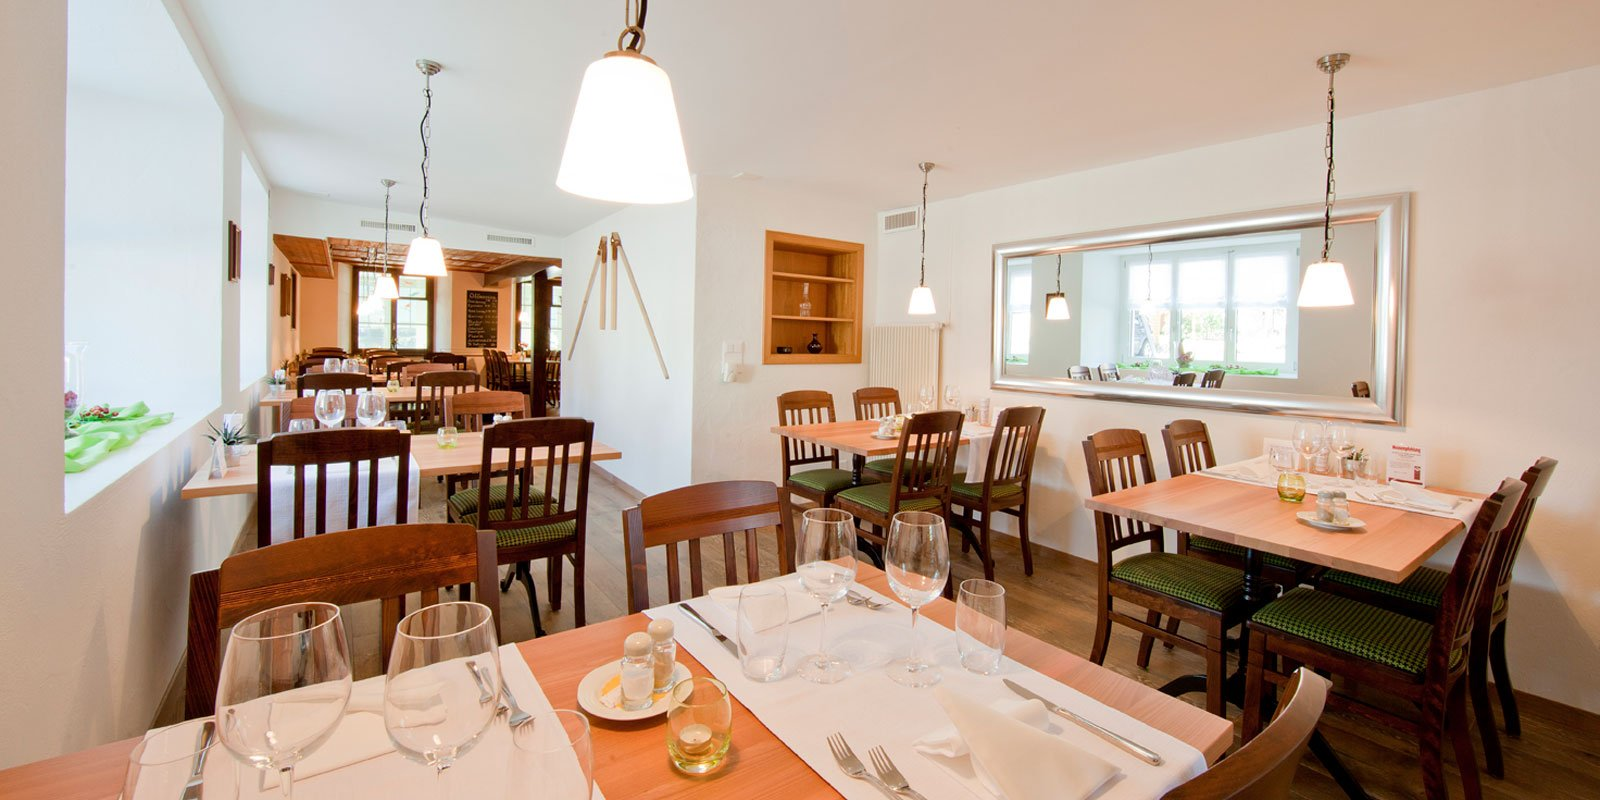 Restaurant Sonne Niederbuchsiten Soleure Vue intérieure Anker Stuebli